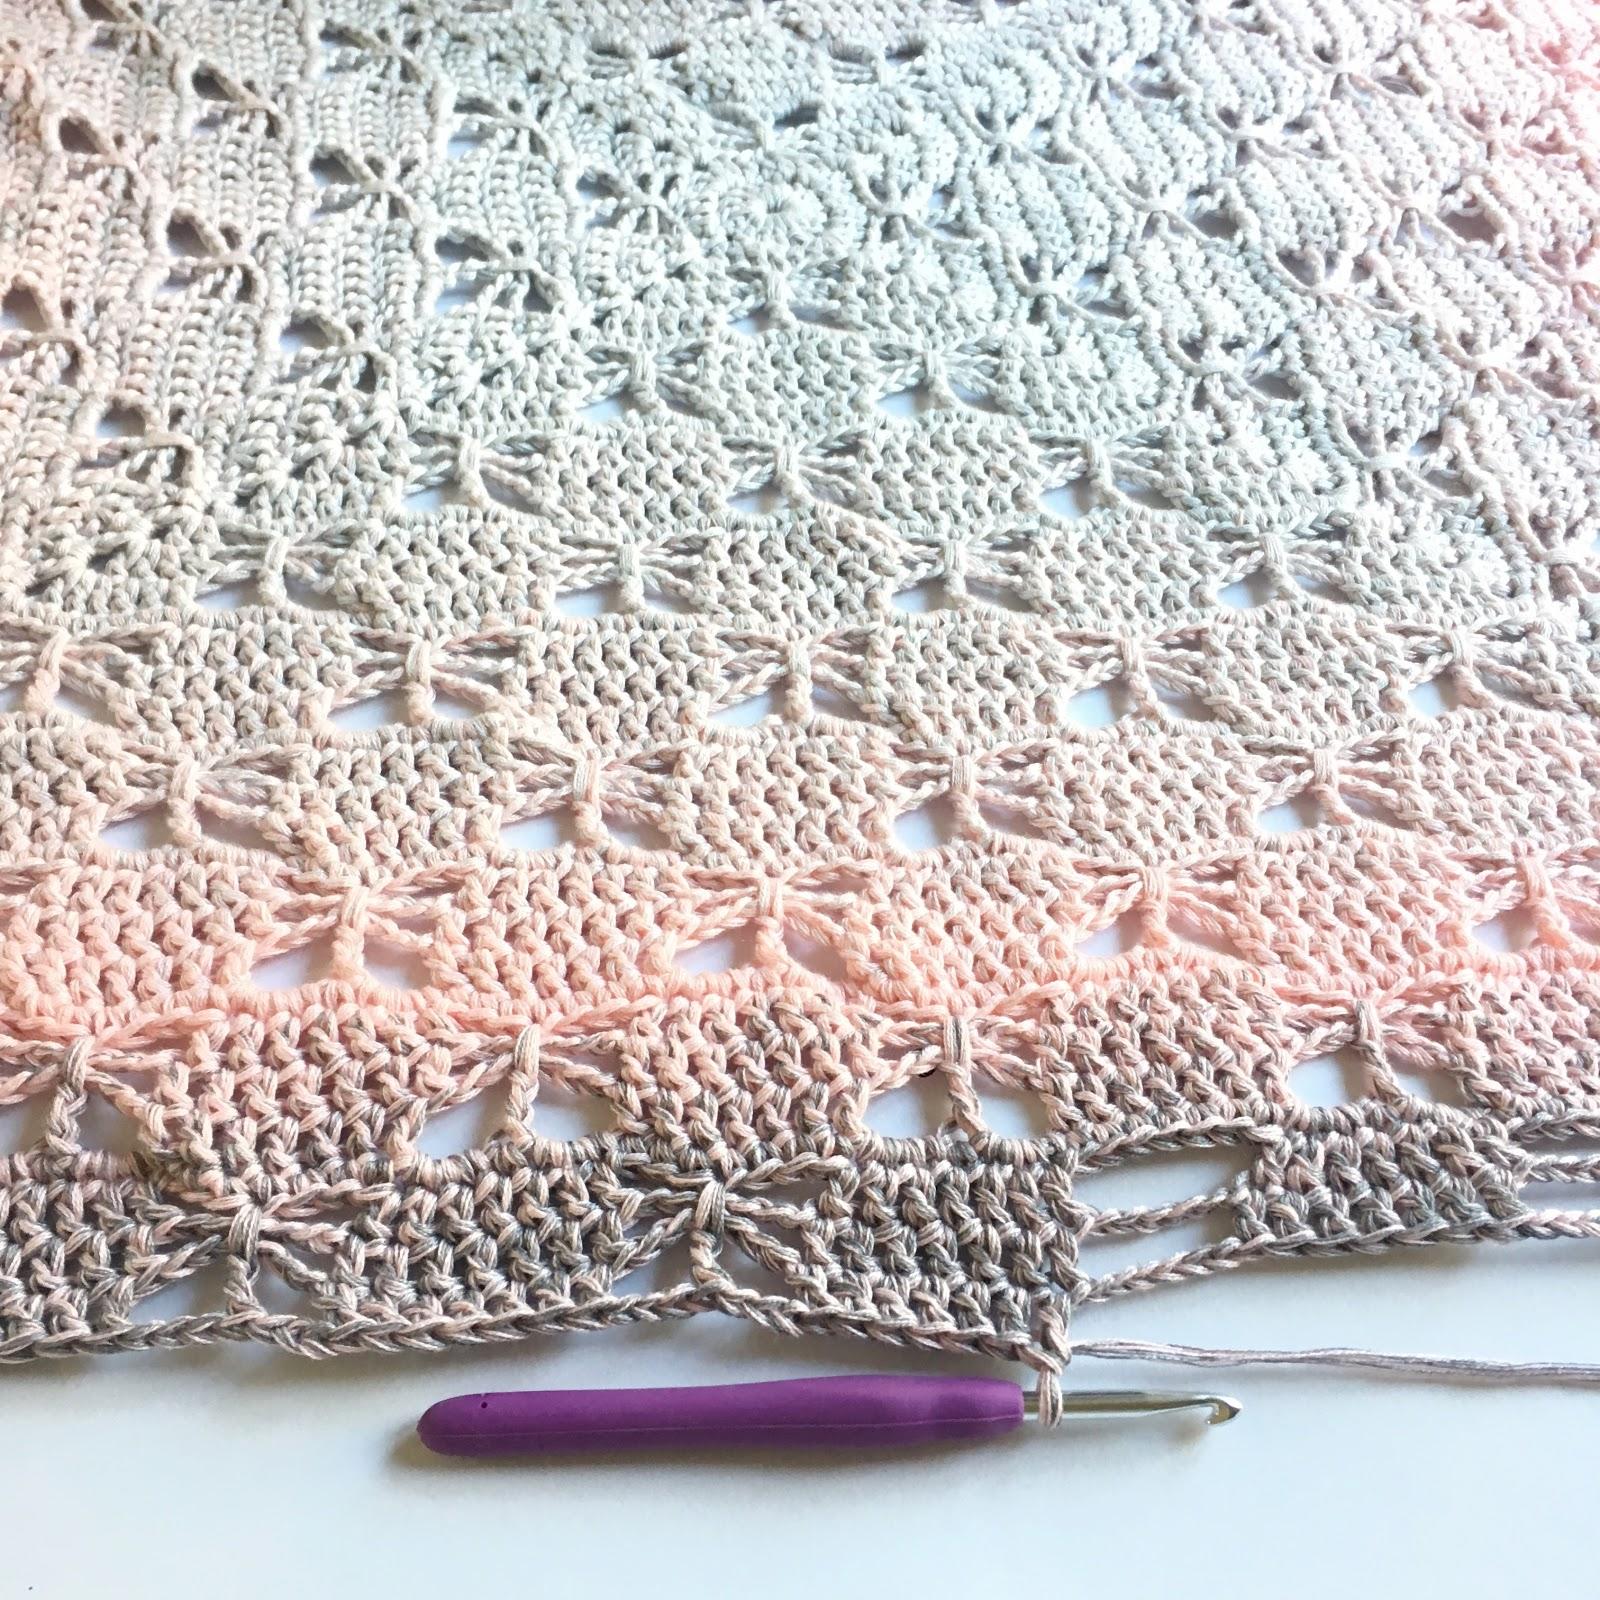 Granny Filet Square Afghan Crochet Pattern